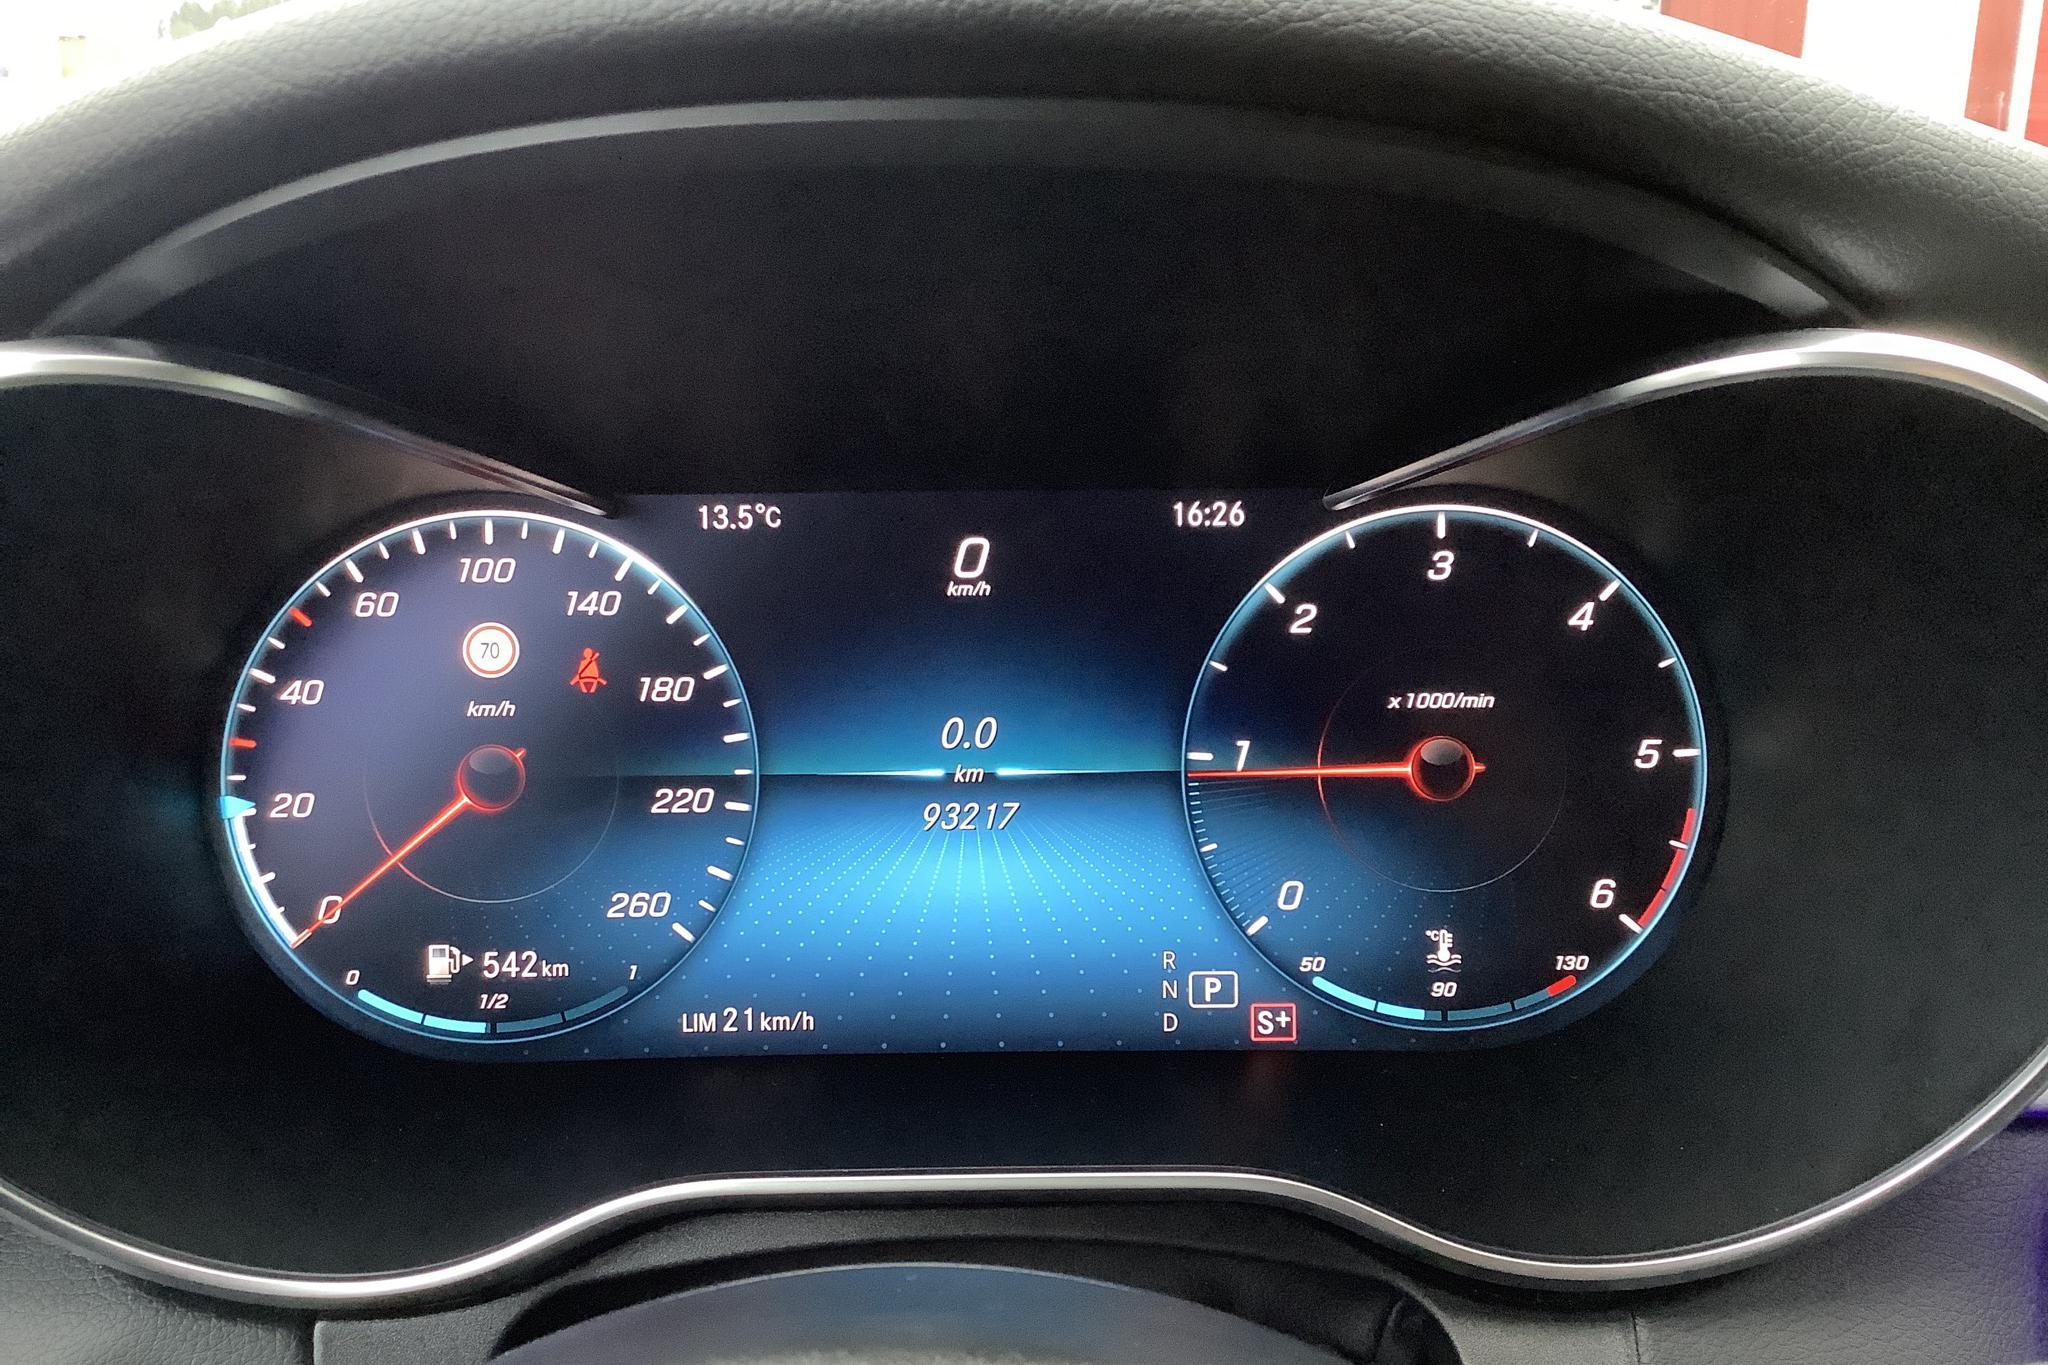 Mercedes C 220 d 4MATIC Kombi S205 (194hk) - 93 220 km - Automatic - gray - 2019